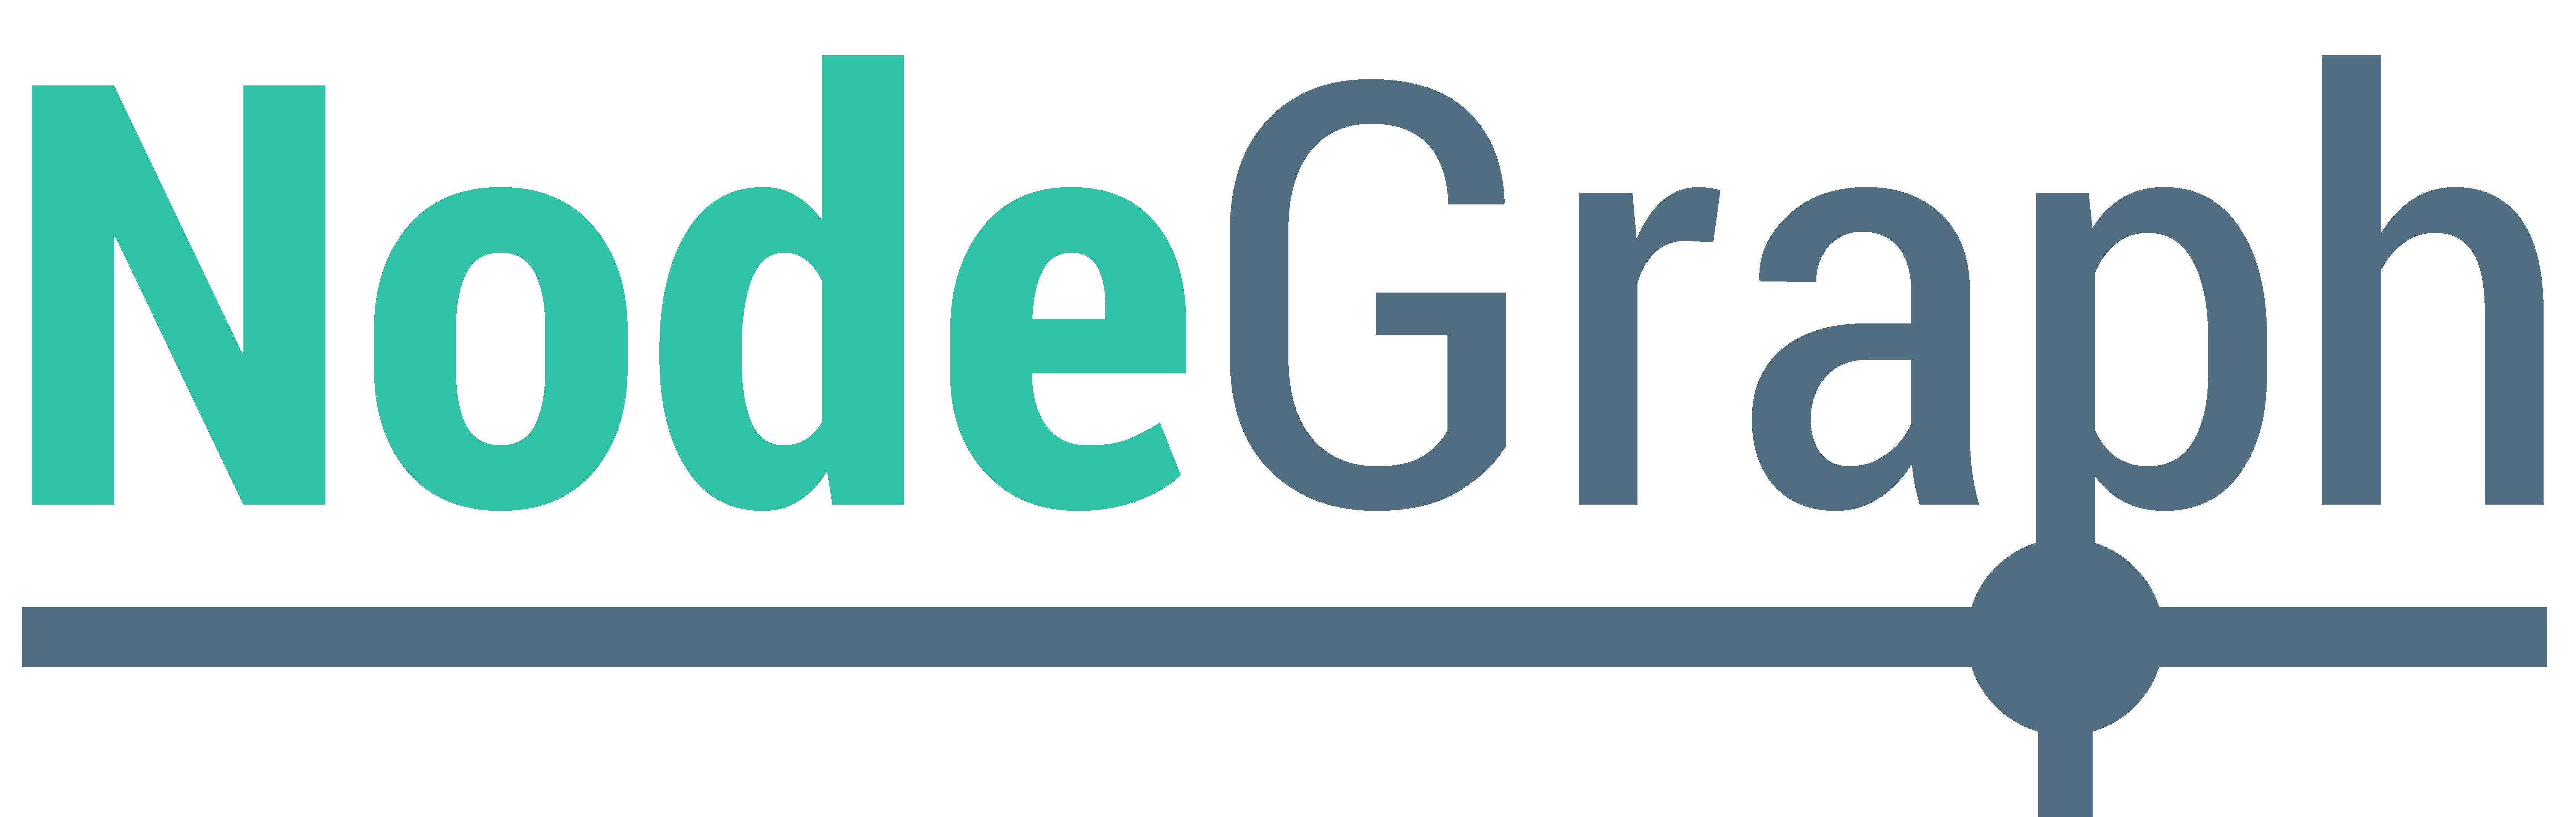 nodegraph-logo.png